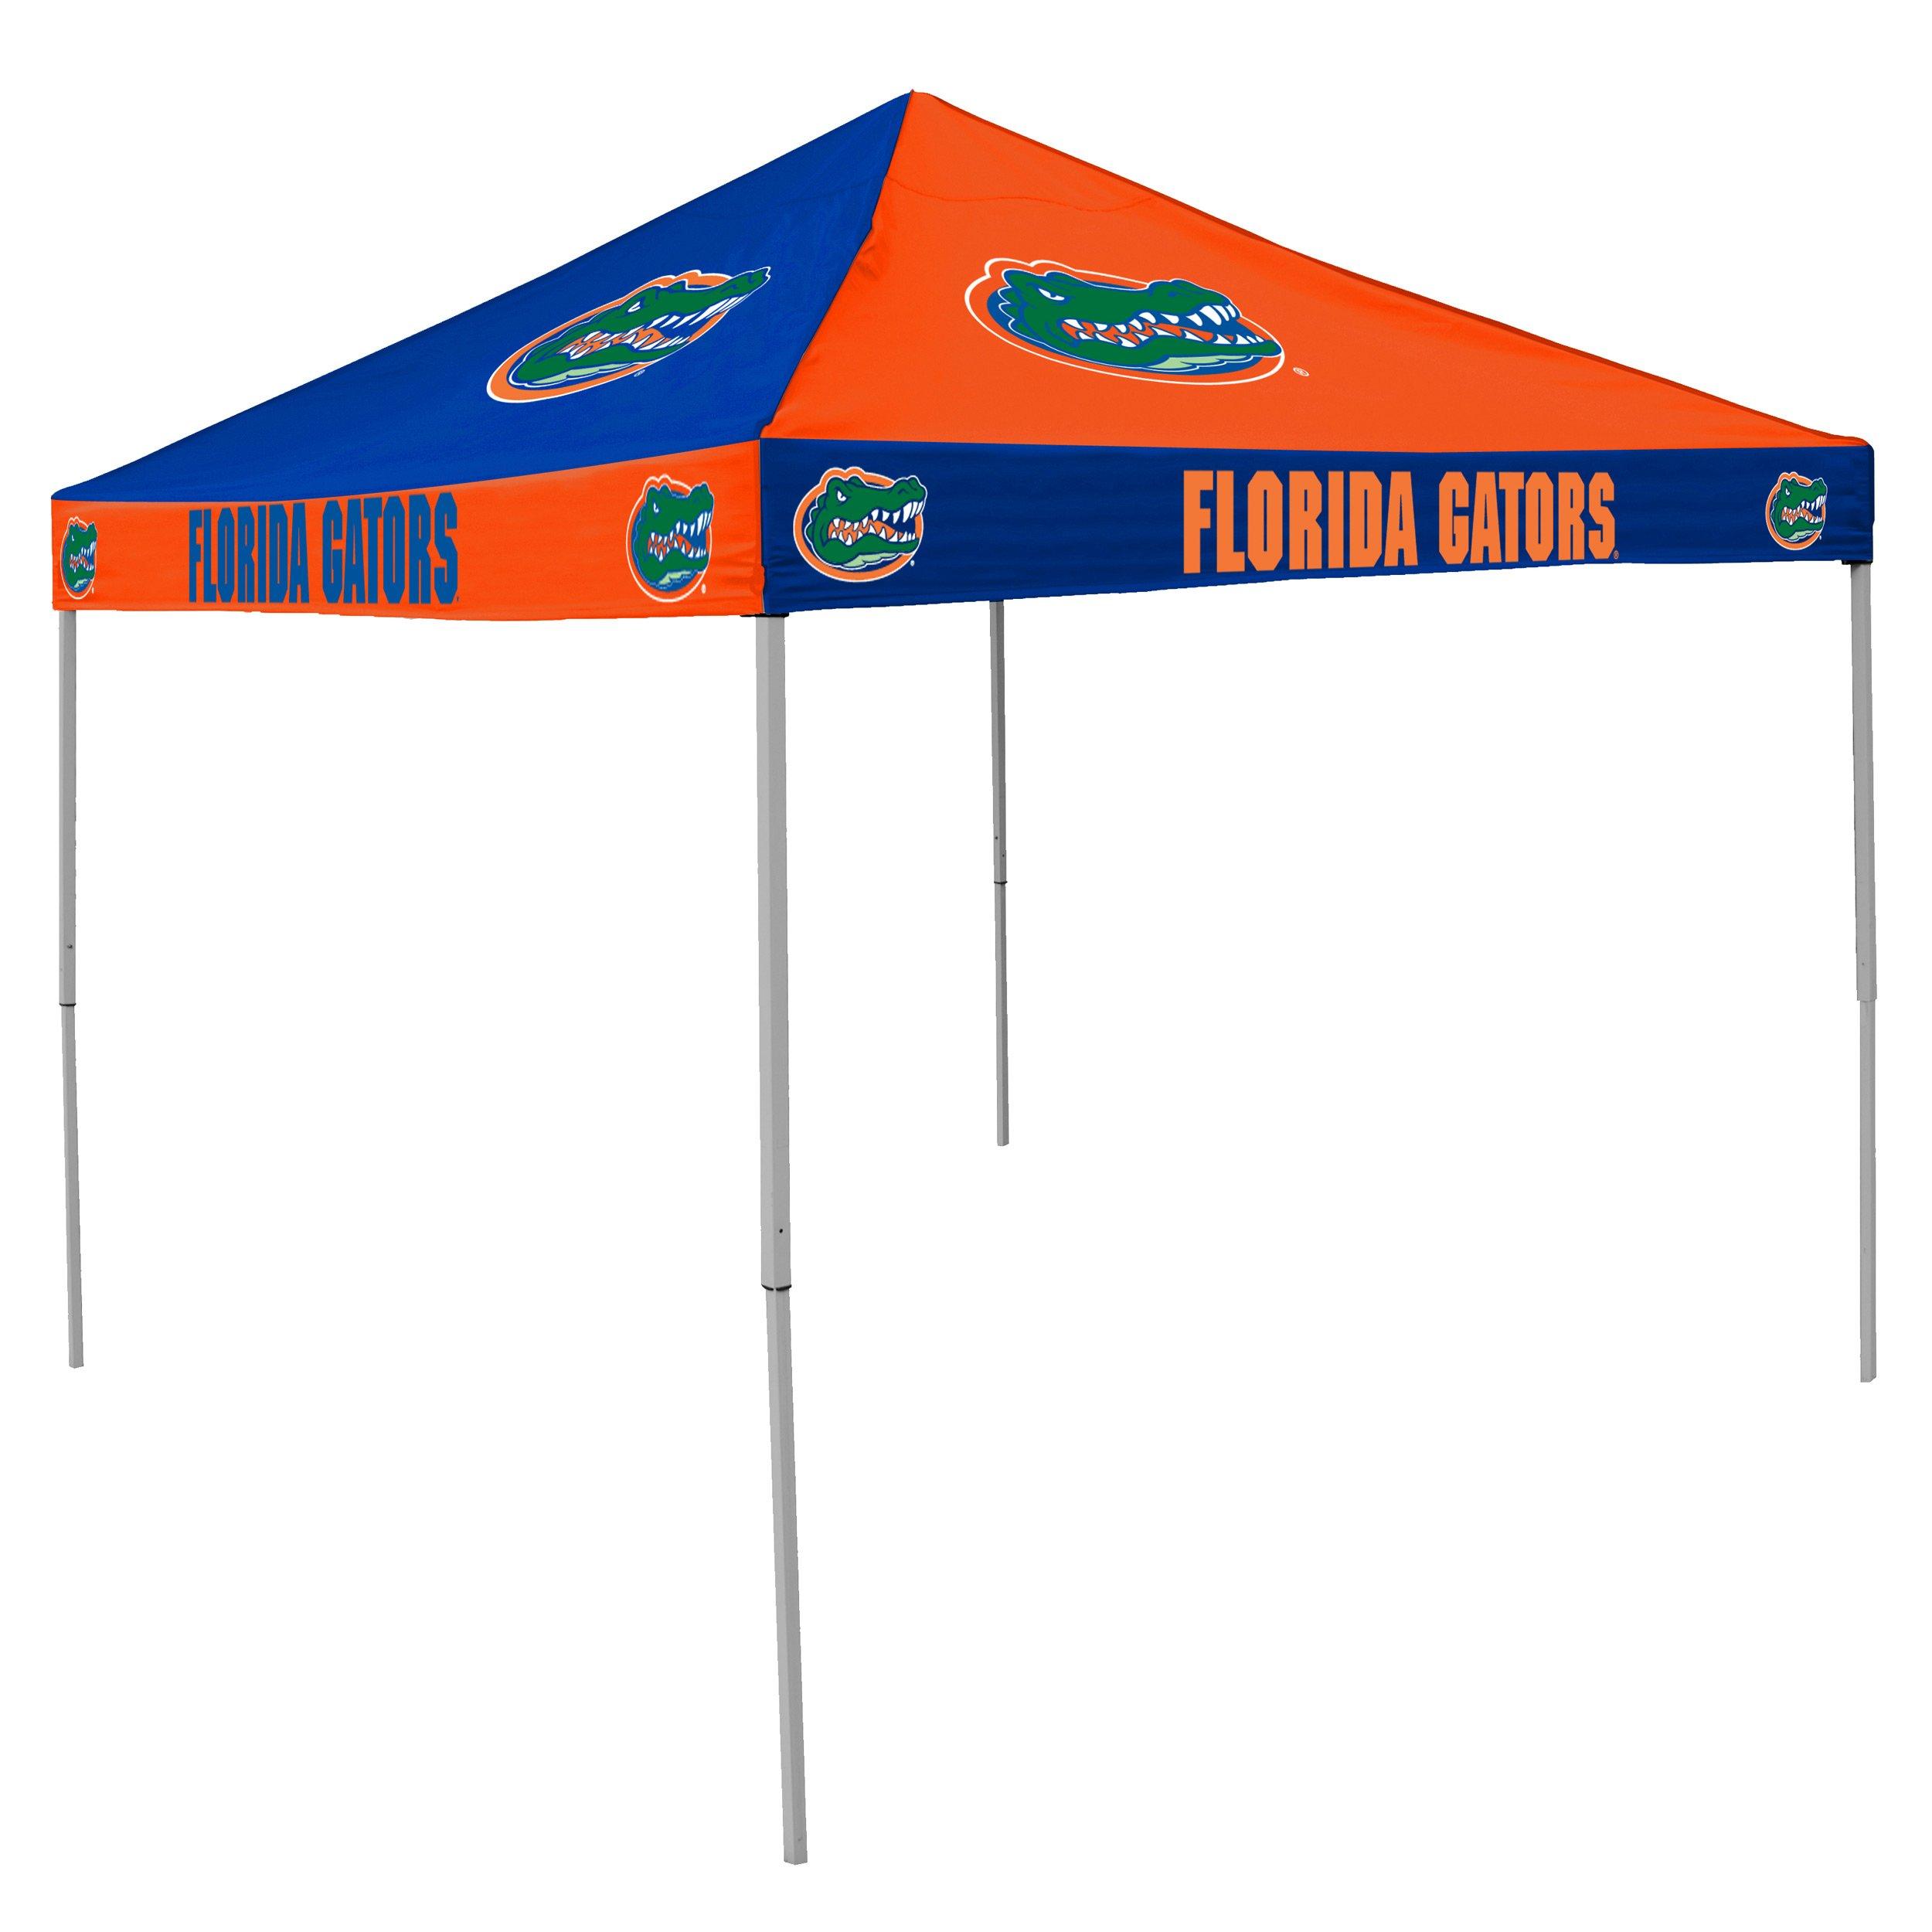 NCAA Florida Gators 9-Foot x 9-Foot Pinwheel Tailgating Canopy, Orange/Blue